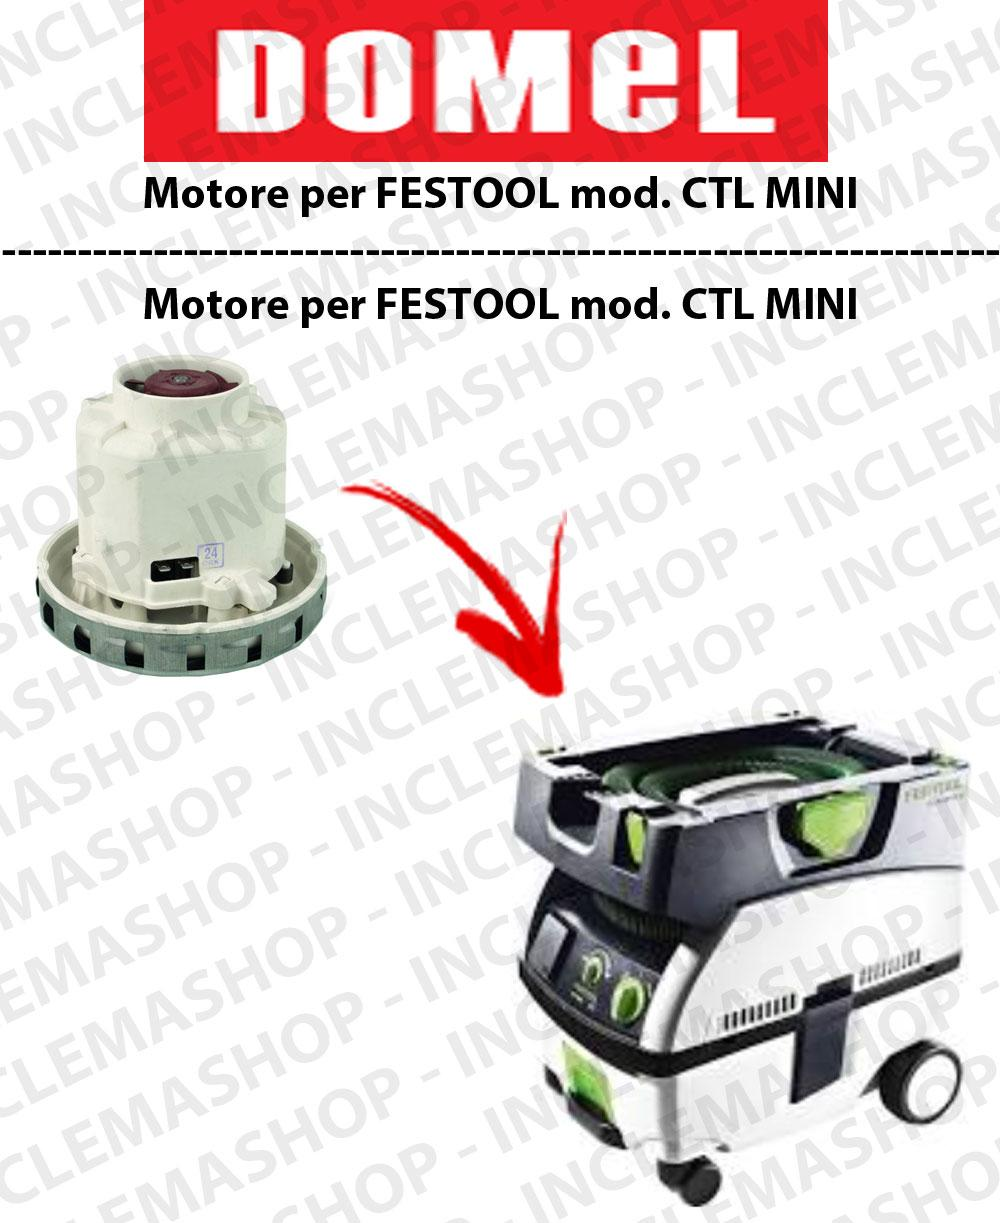 CTL MINI Saugmotor DOMEL für Staubsauger FESTOOL